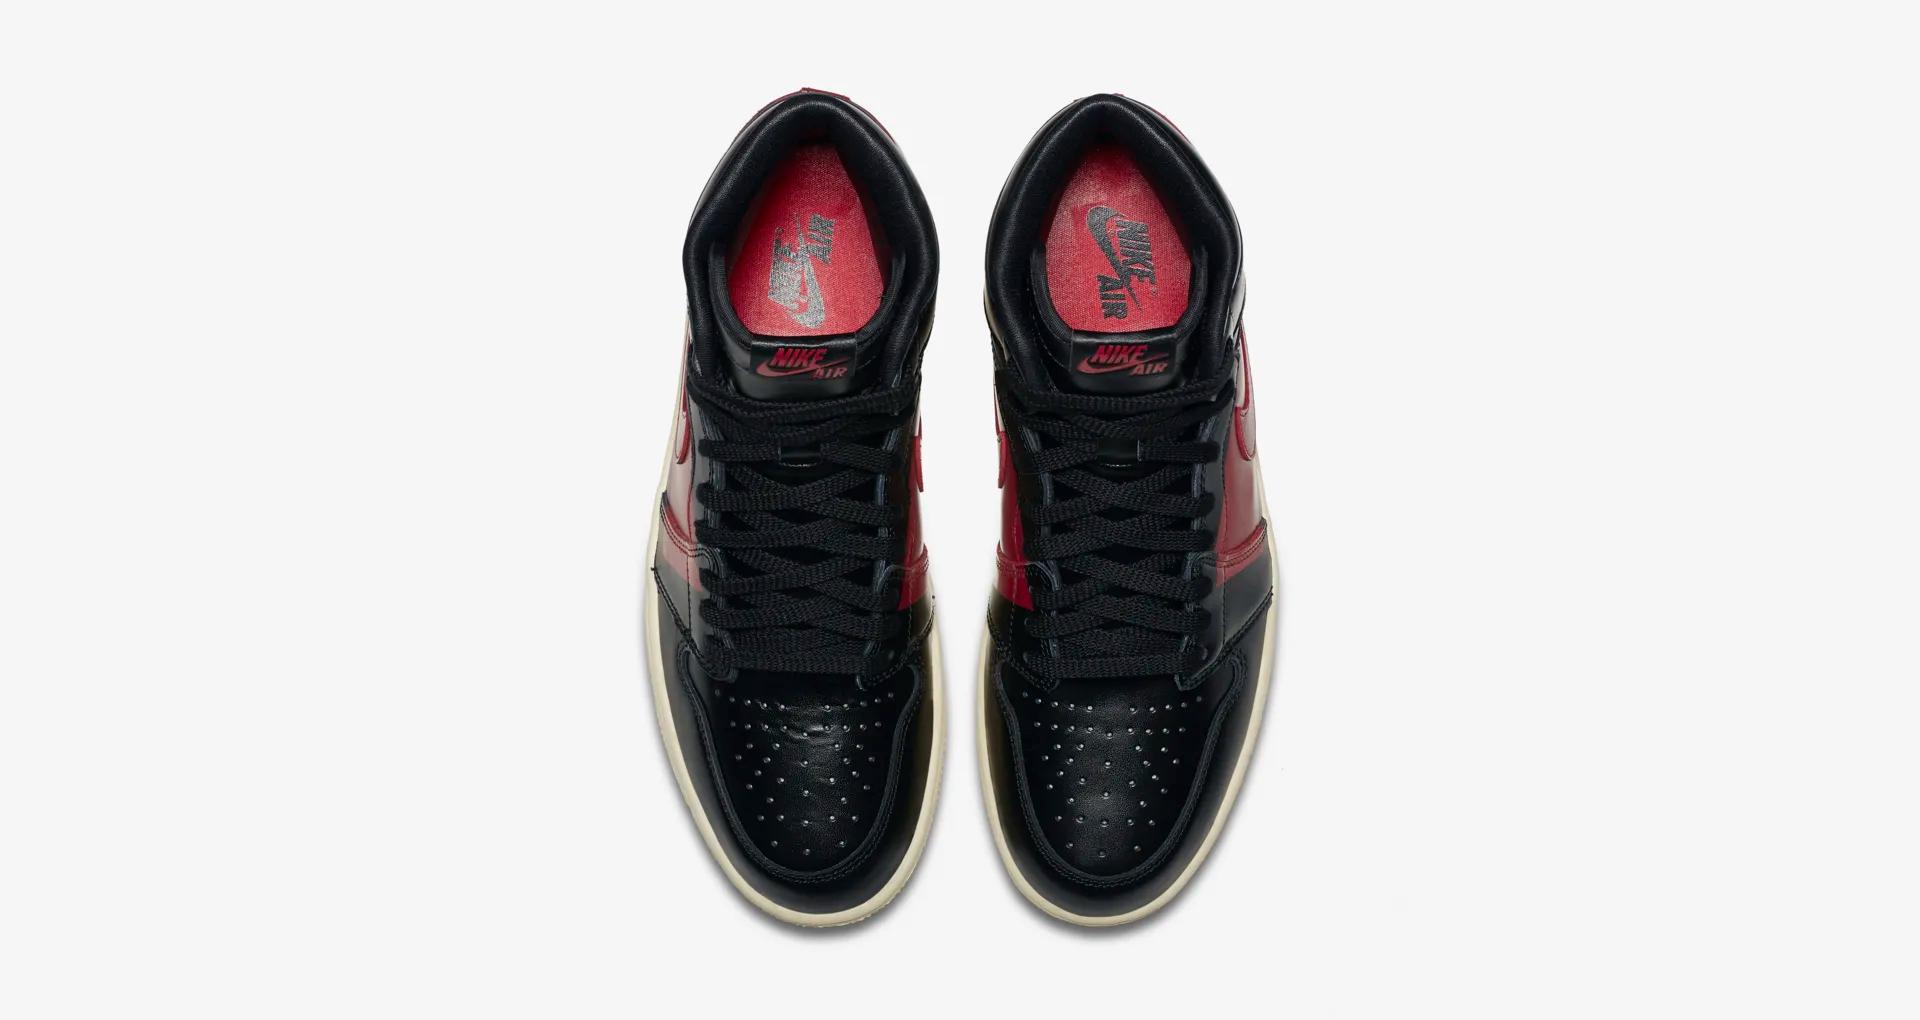 BQ6682 006 Air Jordan 1 High OG Couture 4